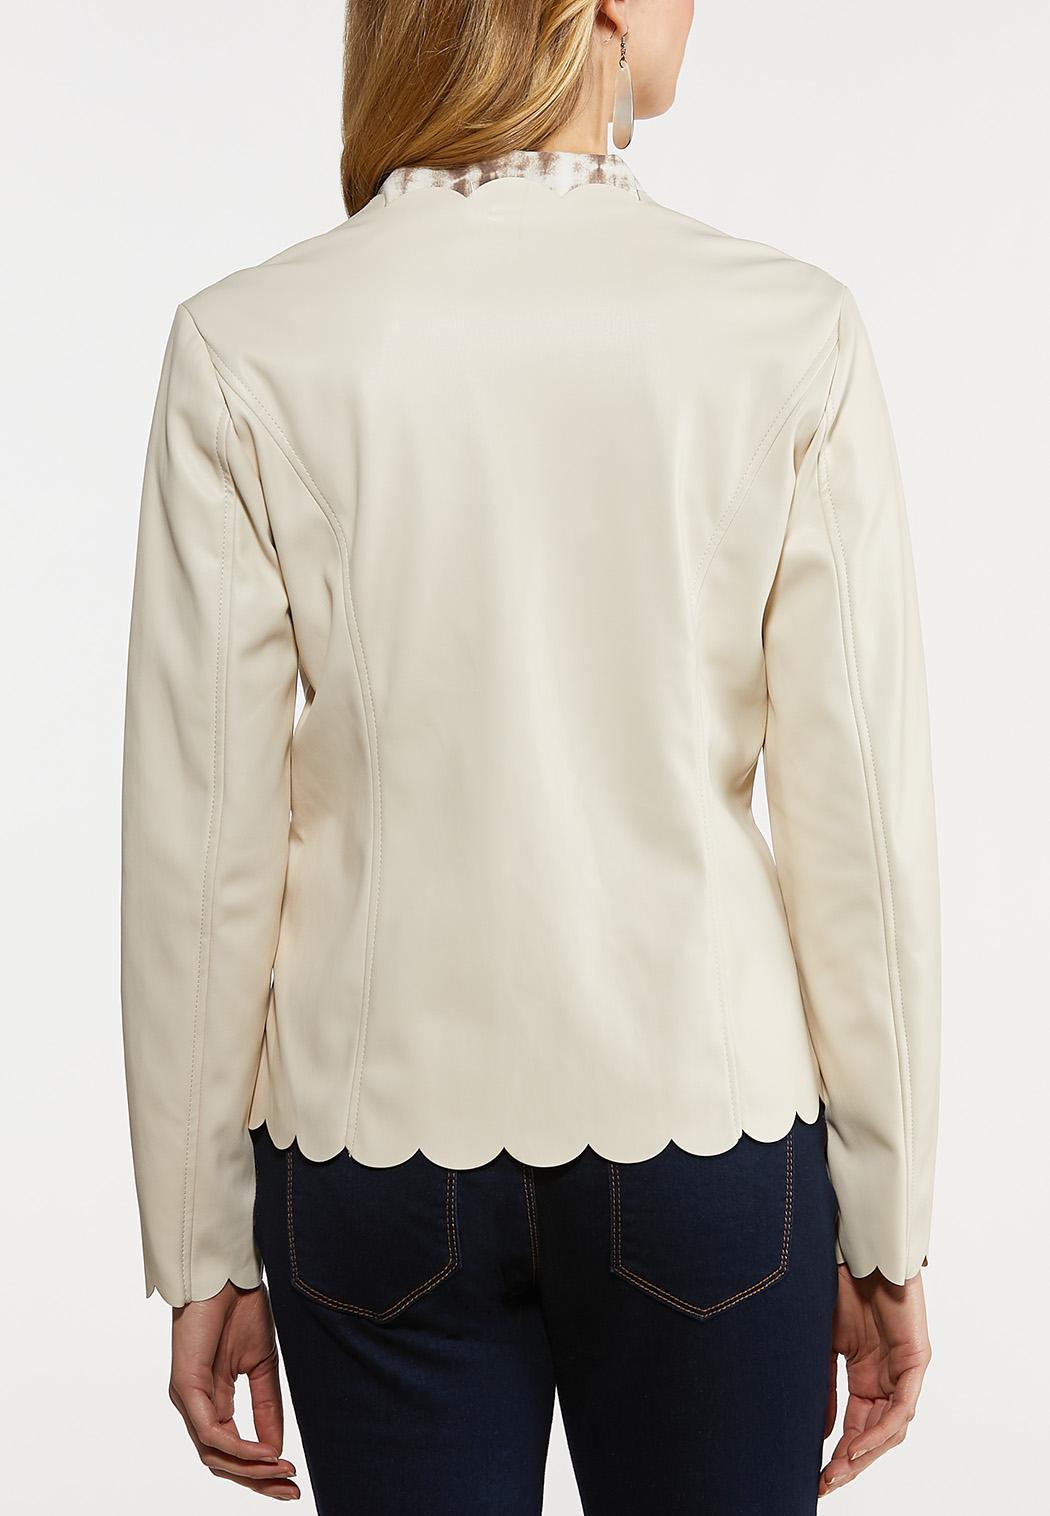 Scalloped Faux Leather Jacket (Item #44134007)